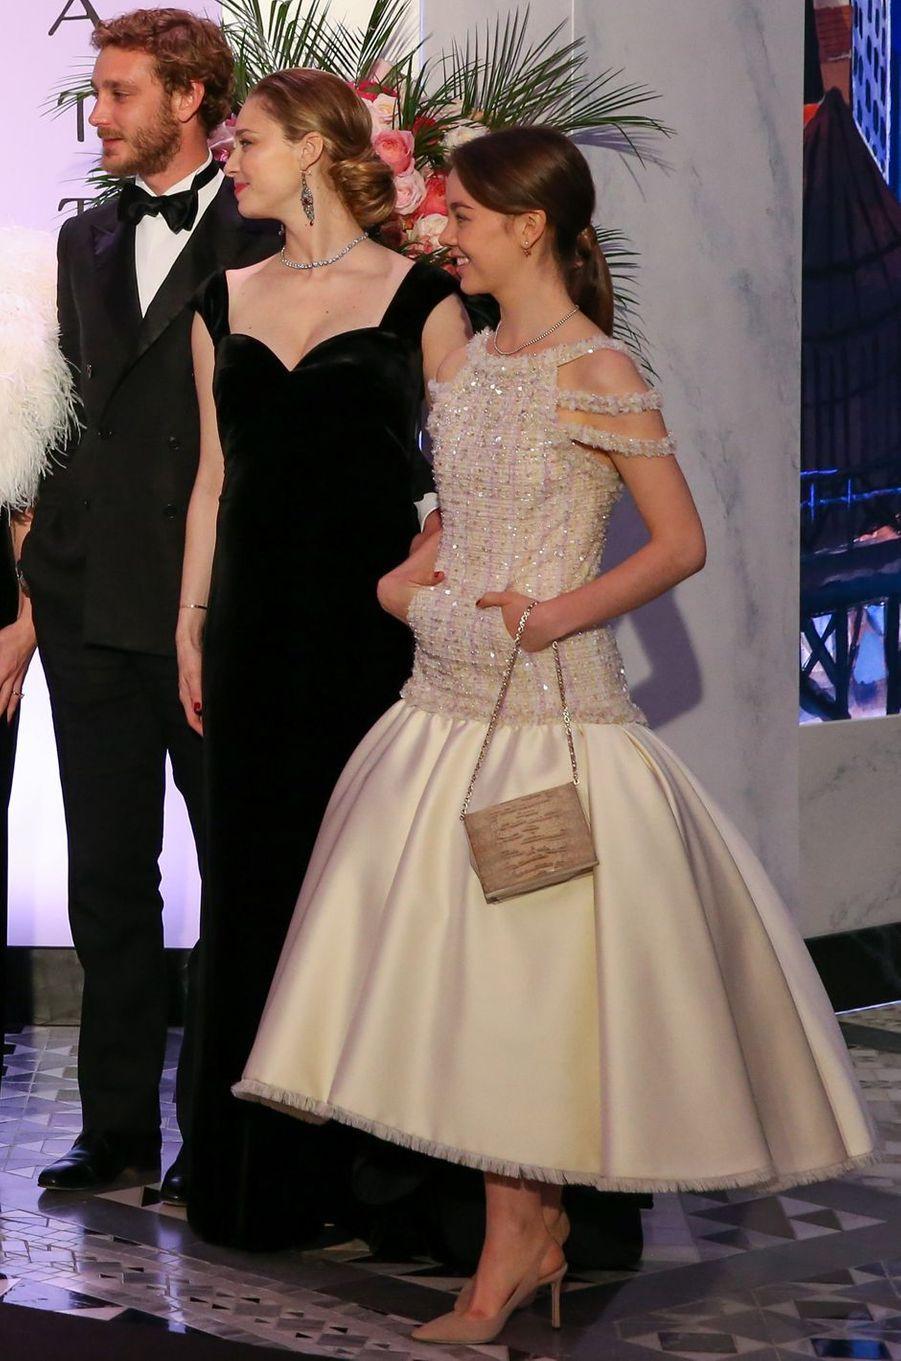 Beatrice Borromeo-Casiraghi et la princesse Alexandra de Hanovre à Monaco, le 24 mars 2018